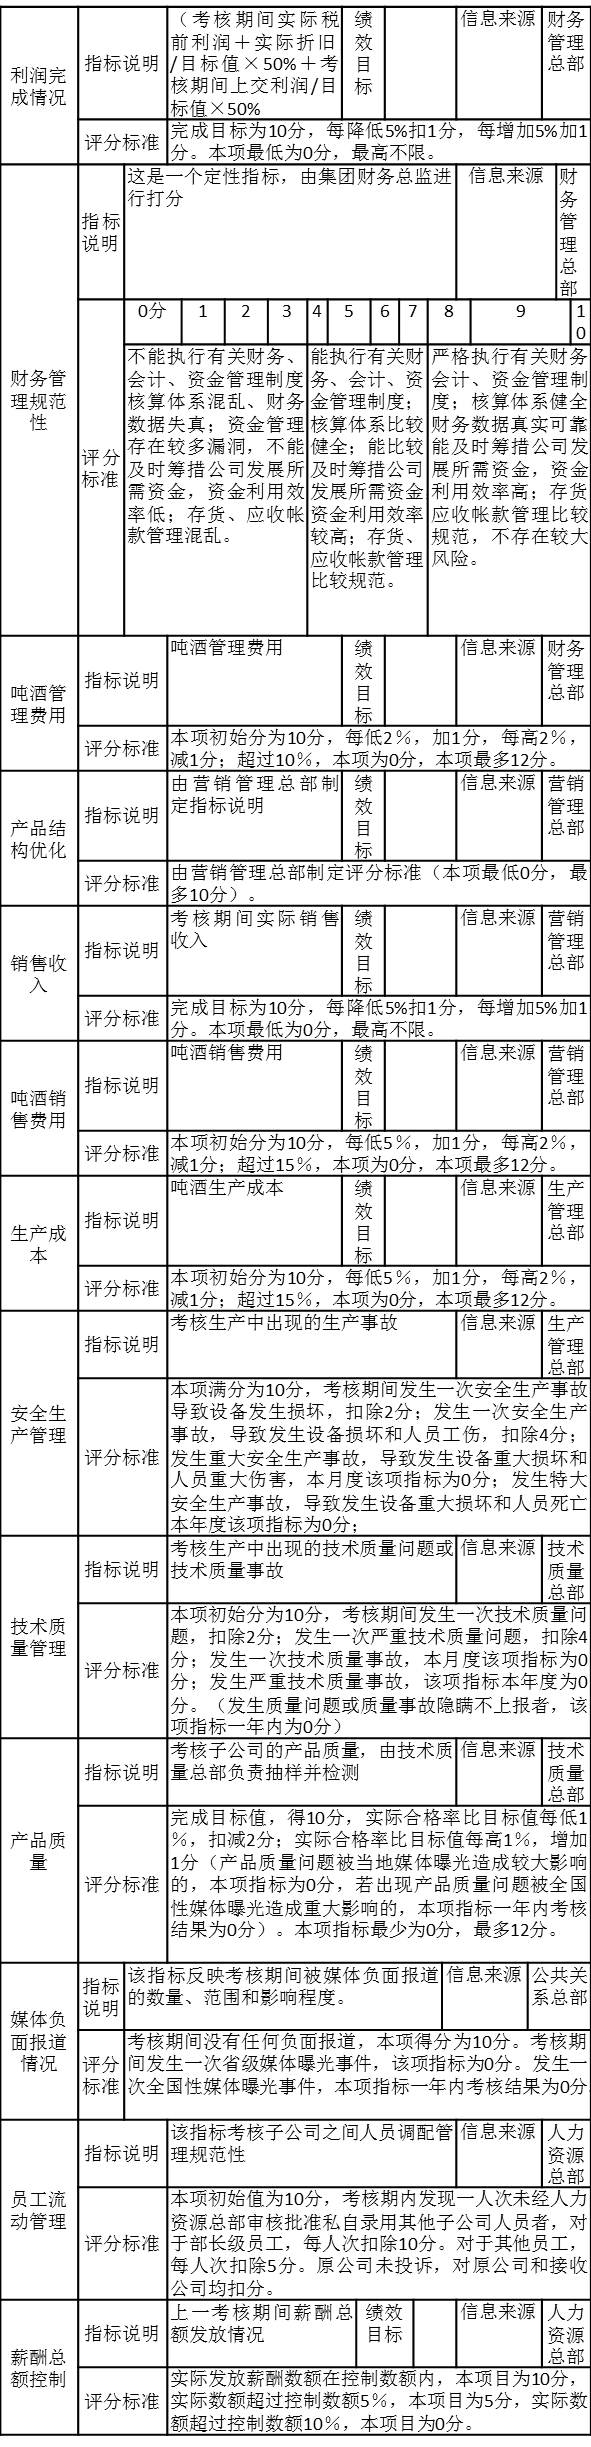 PJ集团子公司第一季度考核注释表